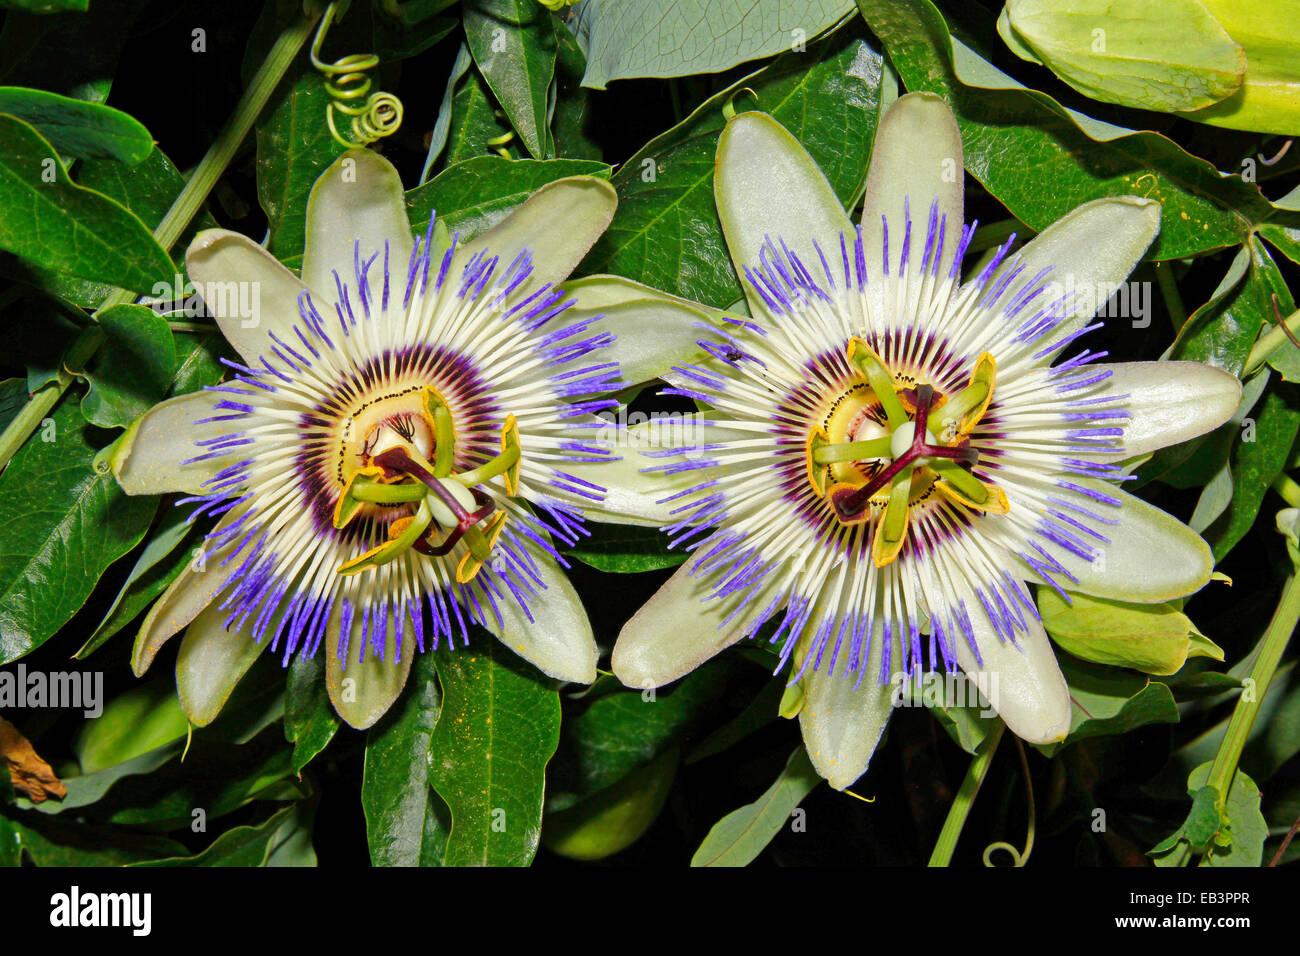 Blue Passion Flower Or Common Passion Flower Passiflora Caerulea